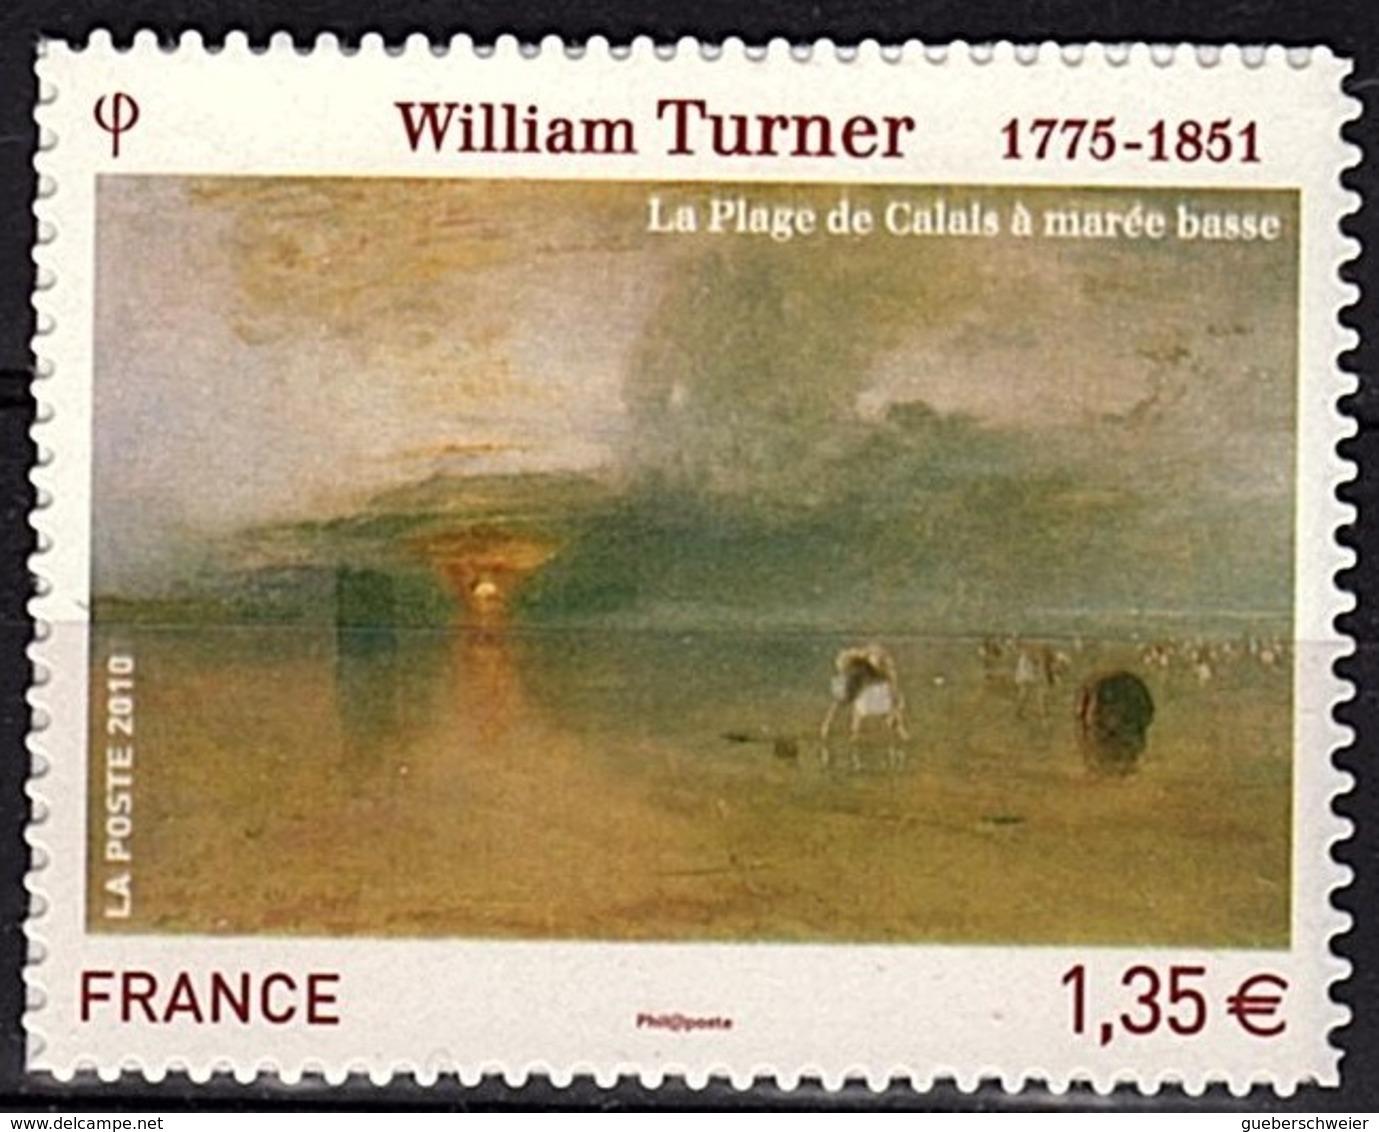 ADH 67 - FRANCE Adhésifs N° 402 Neuf** William Turner - Adhésifs (autocollants)